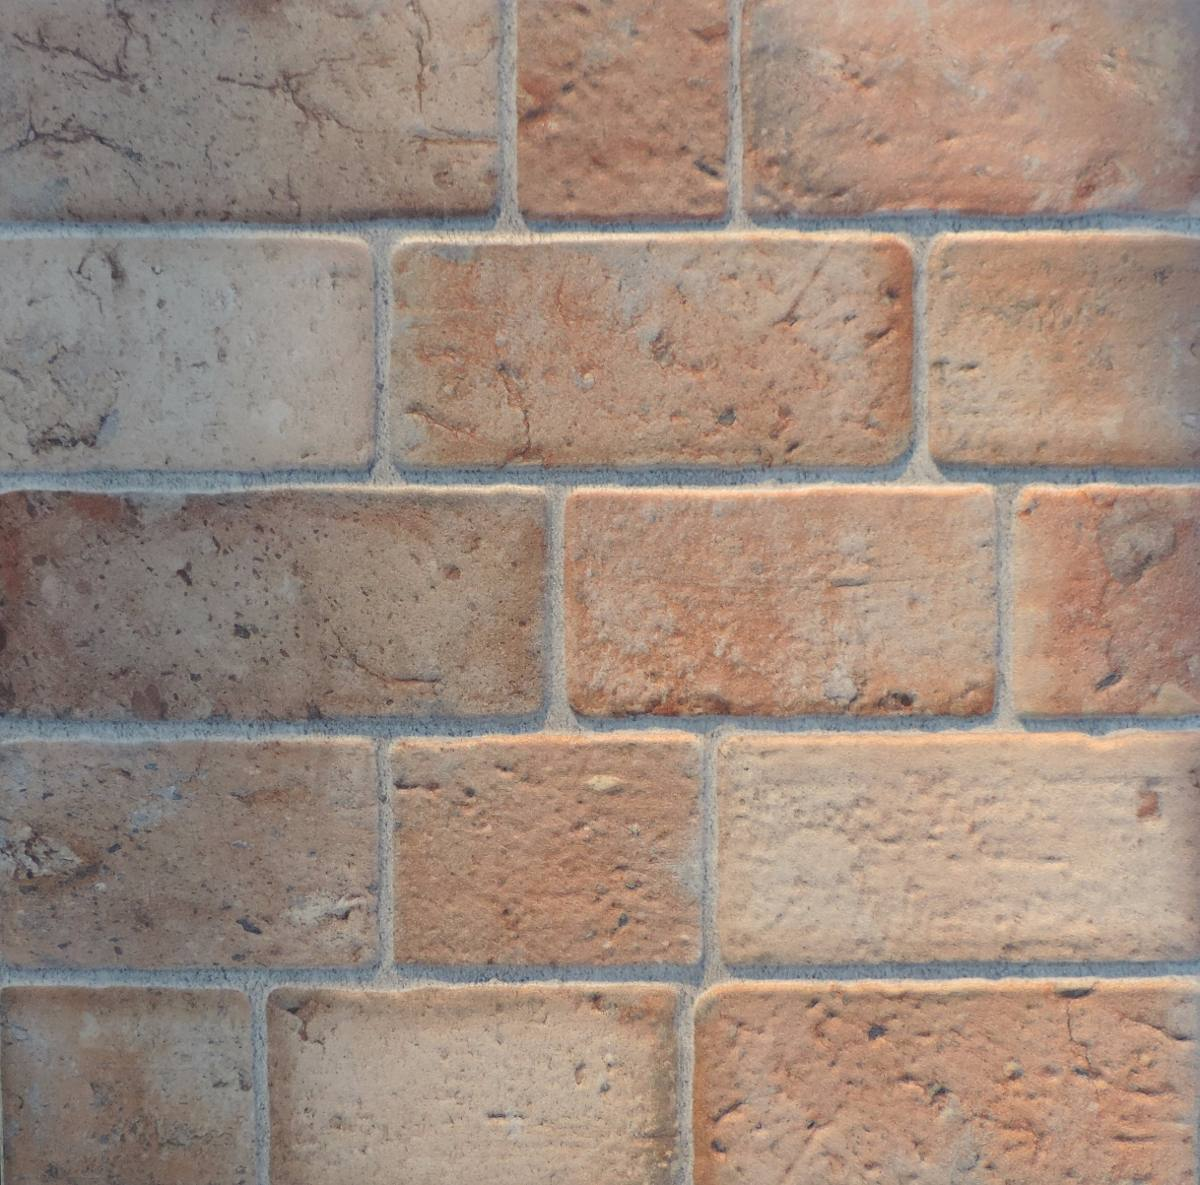 Ceramica piso pared exterior interior primera ceramicasuy for Ceramica exterior